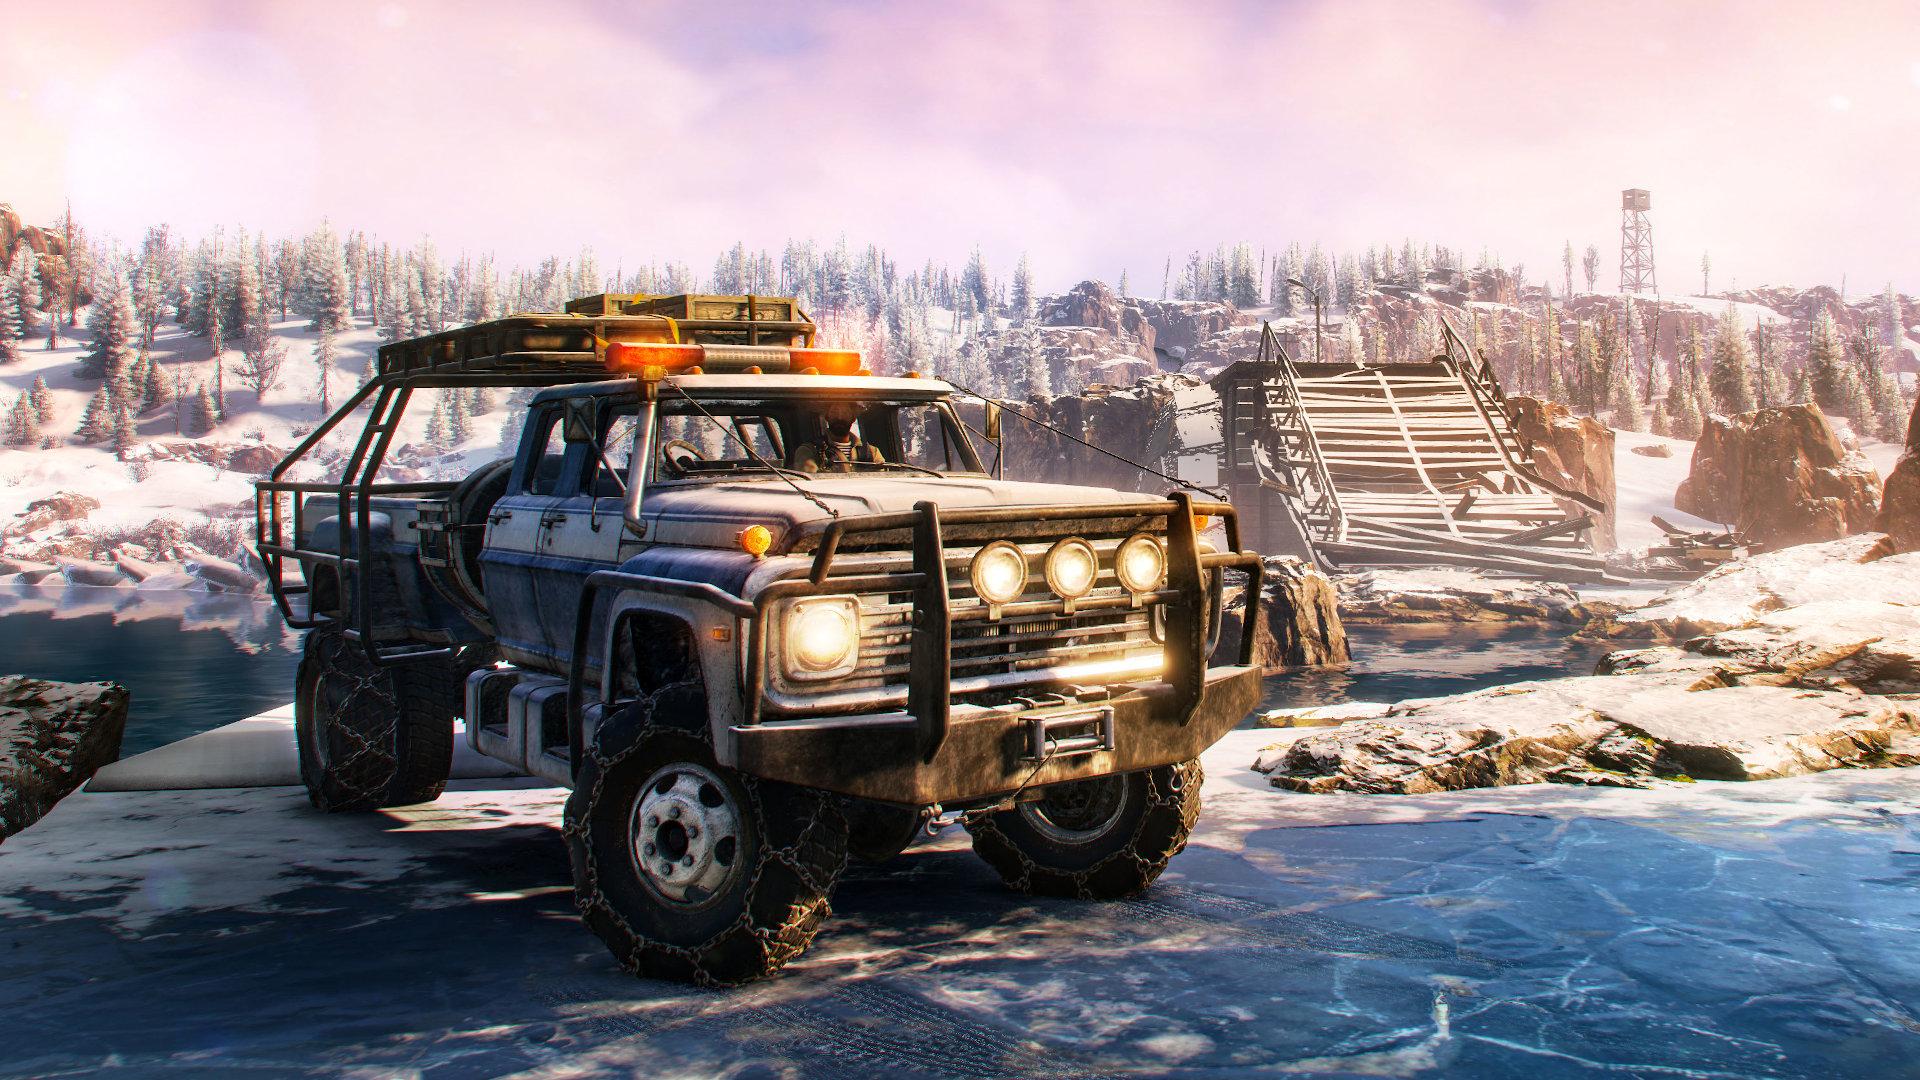 SnowRunner reveals spectacular screenshots as Season 2: Explore & Expand revs up on November 16